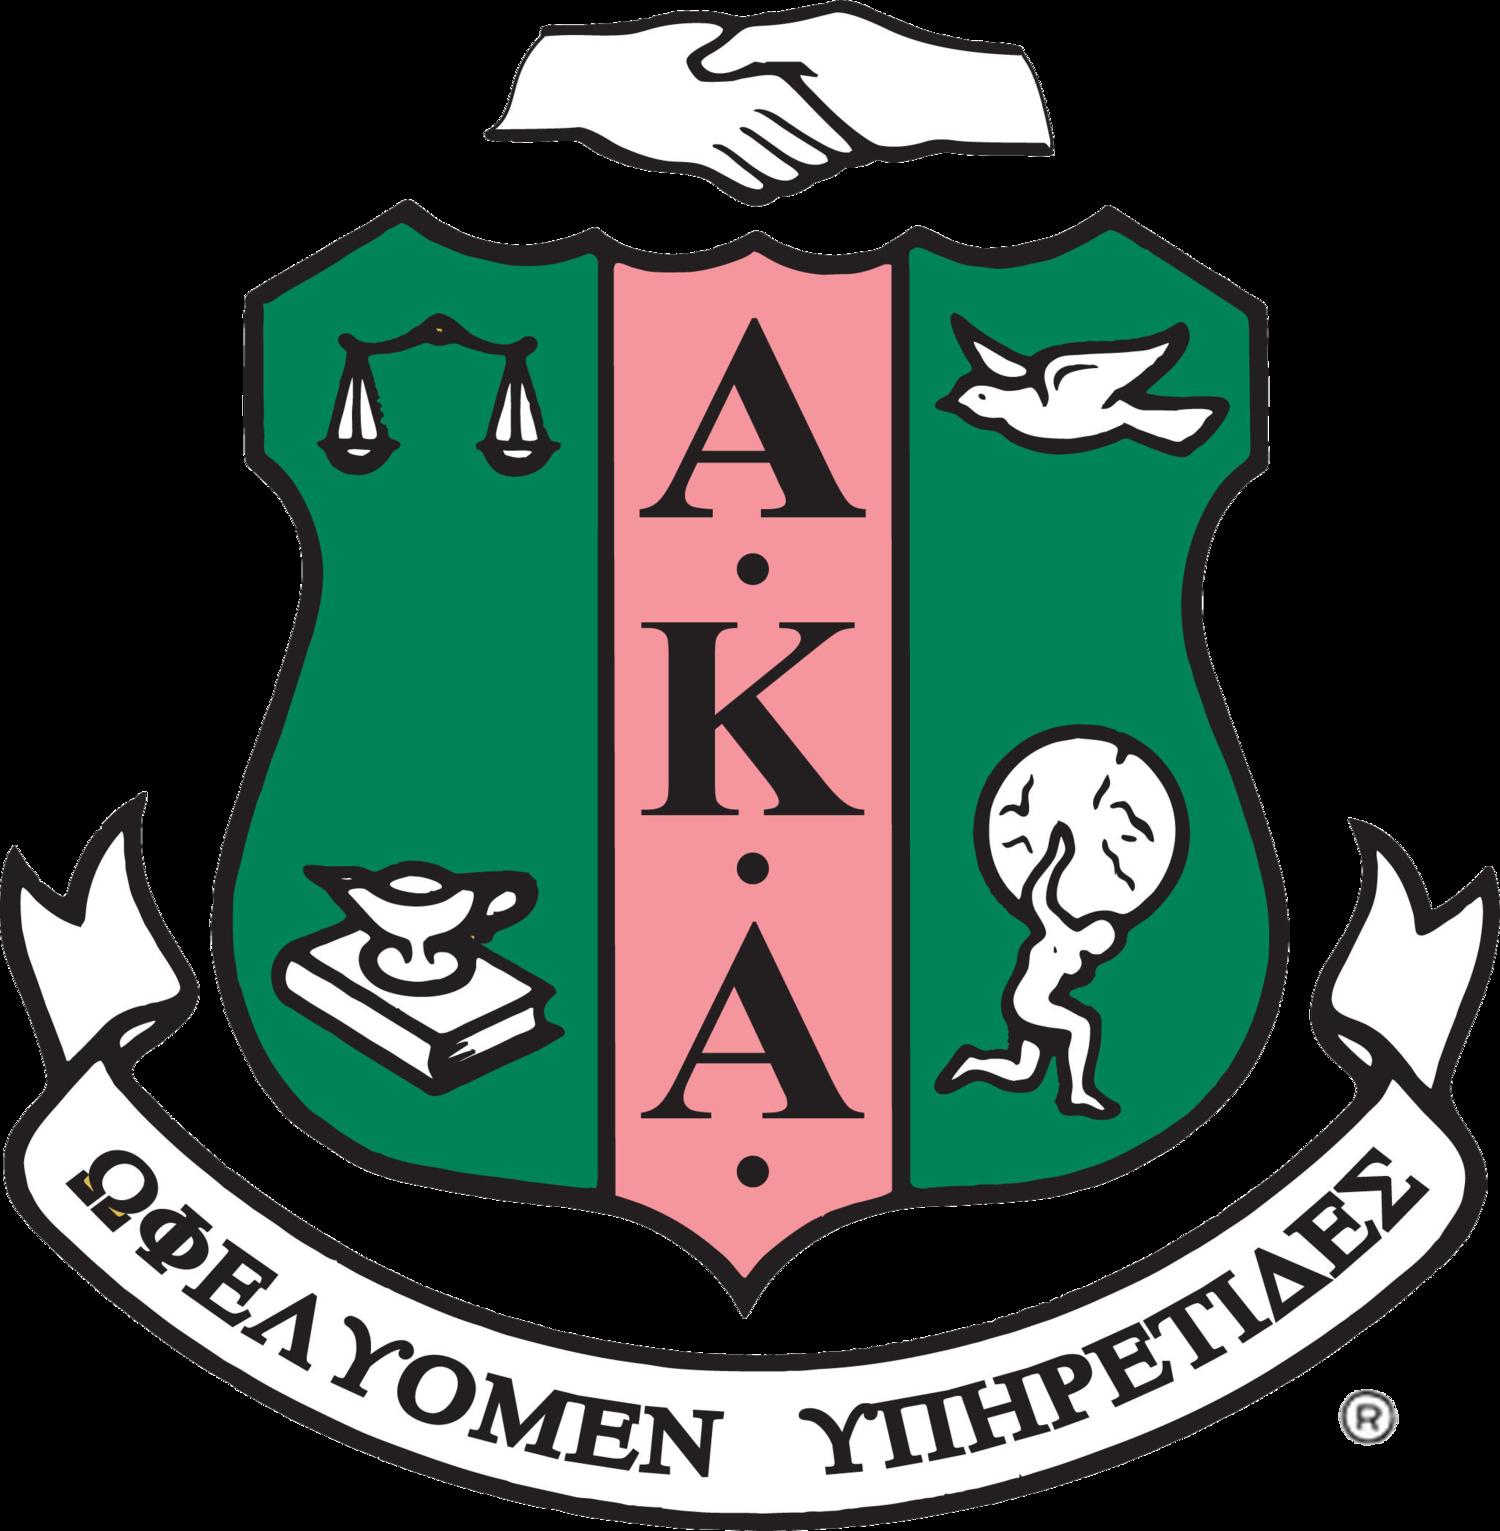 Alpha Kappa Alpha Sorority Incorporated